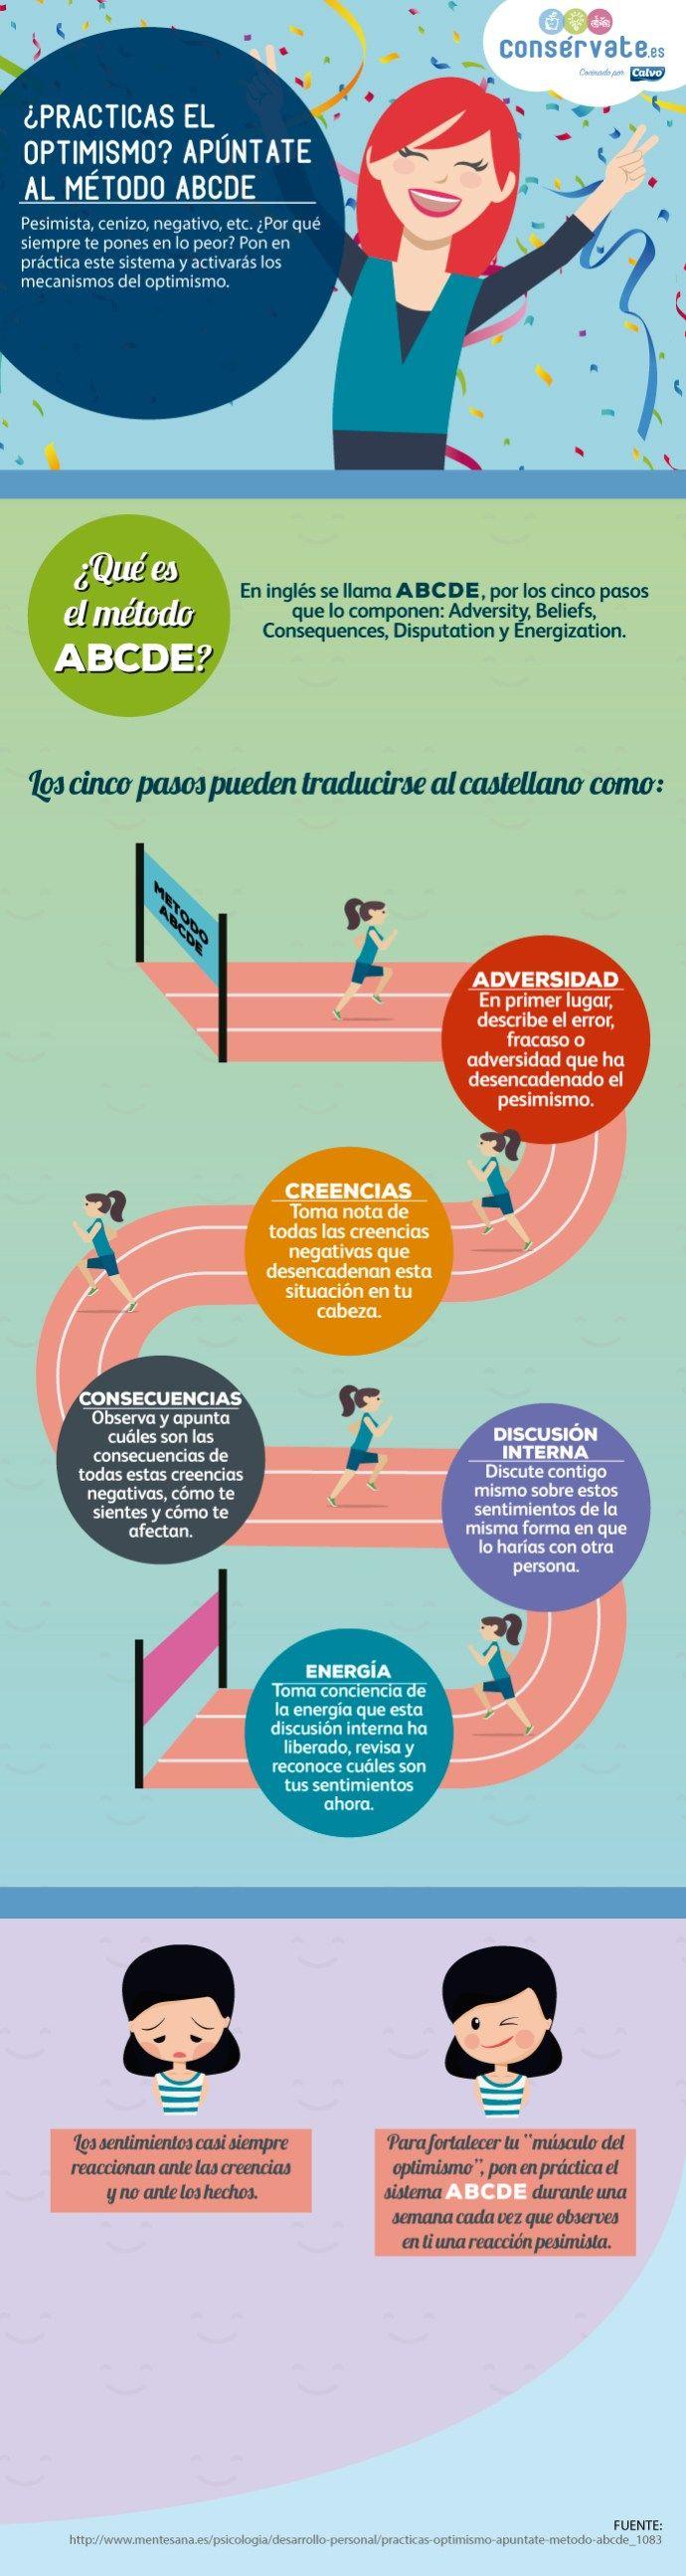 Método ABCDE para el optimismo #infografia